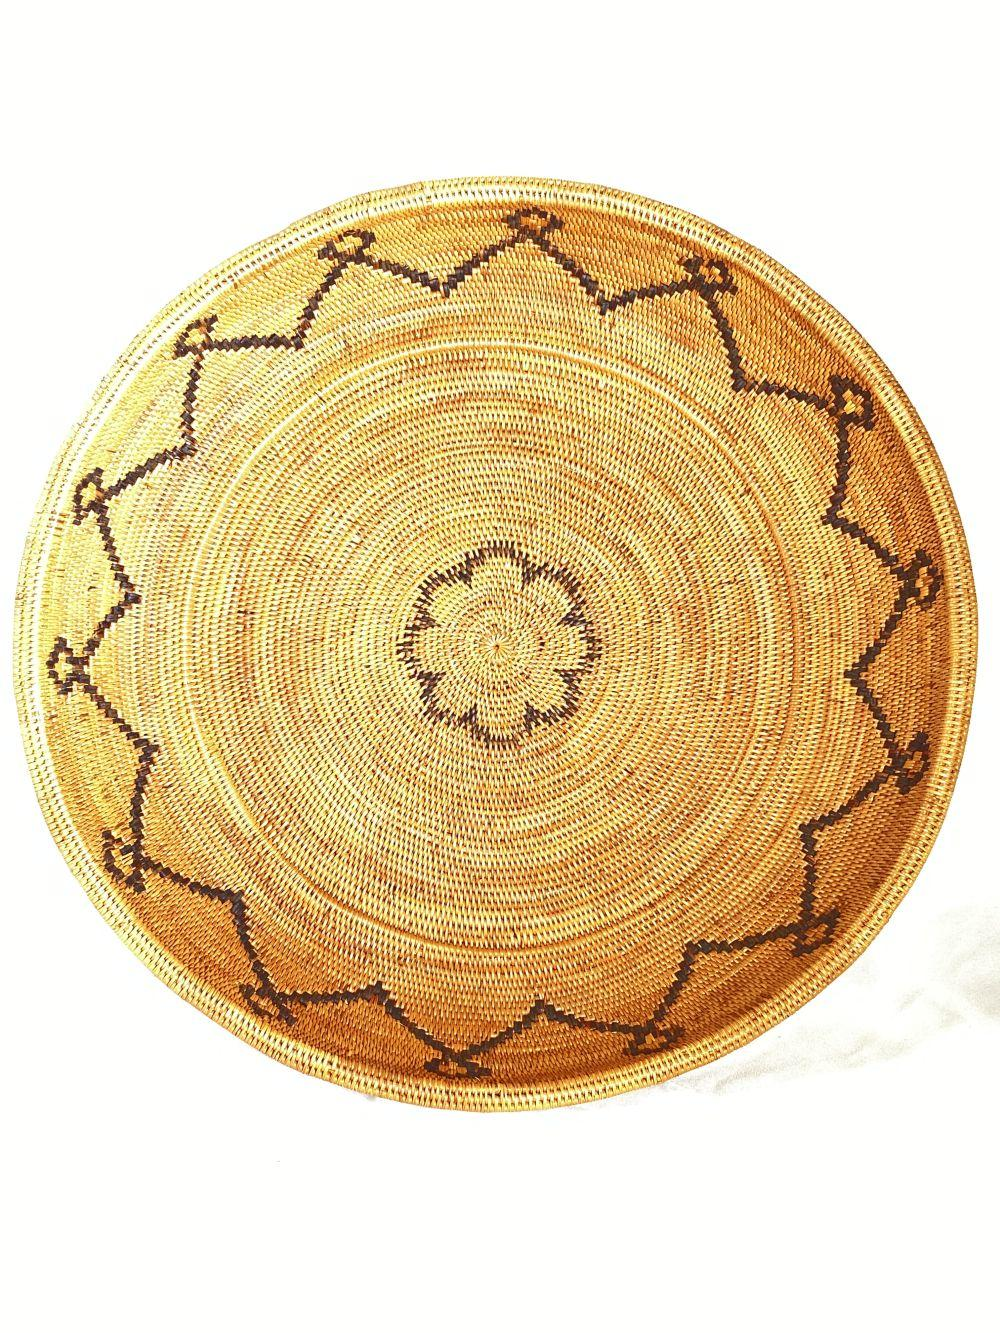 South African Zulu Basket Llala Palm